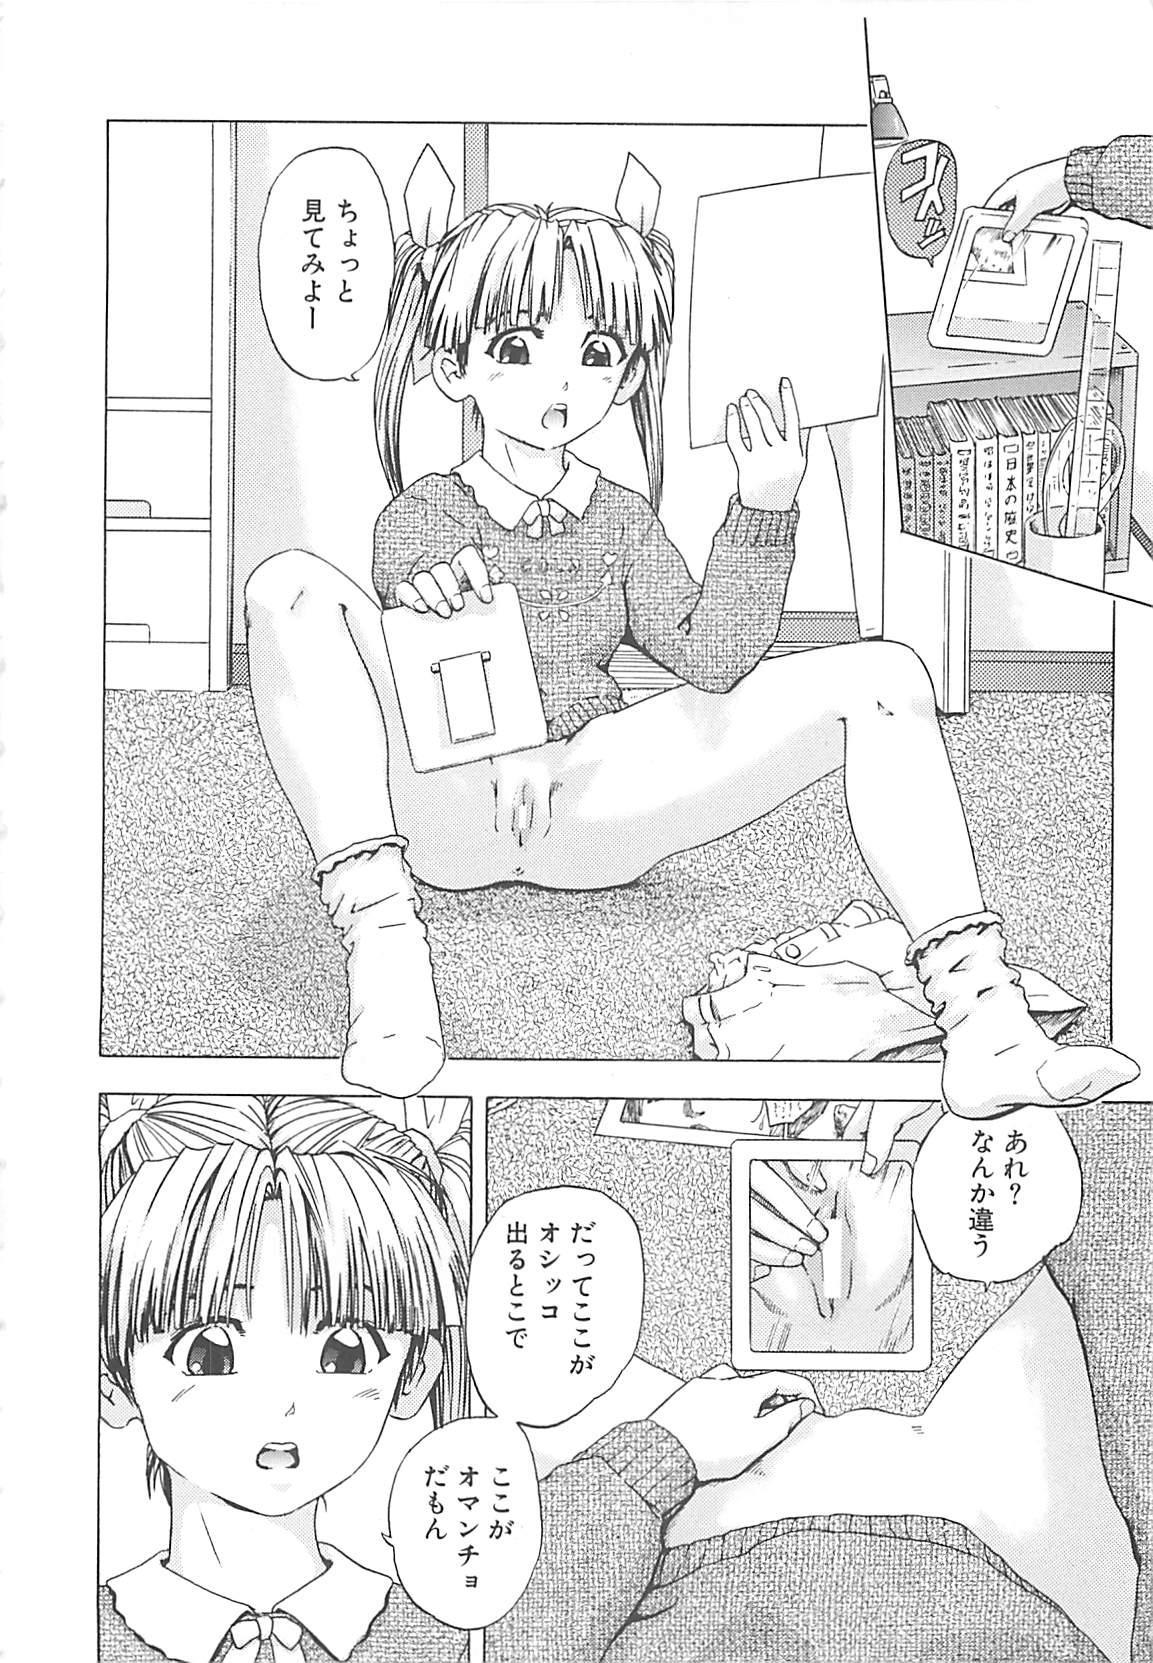 Kanin Kyoushitsu - Adultery Classroom 6